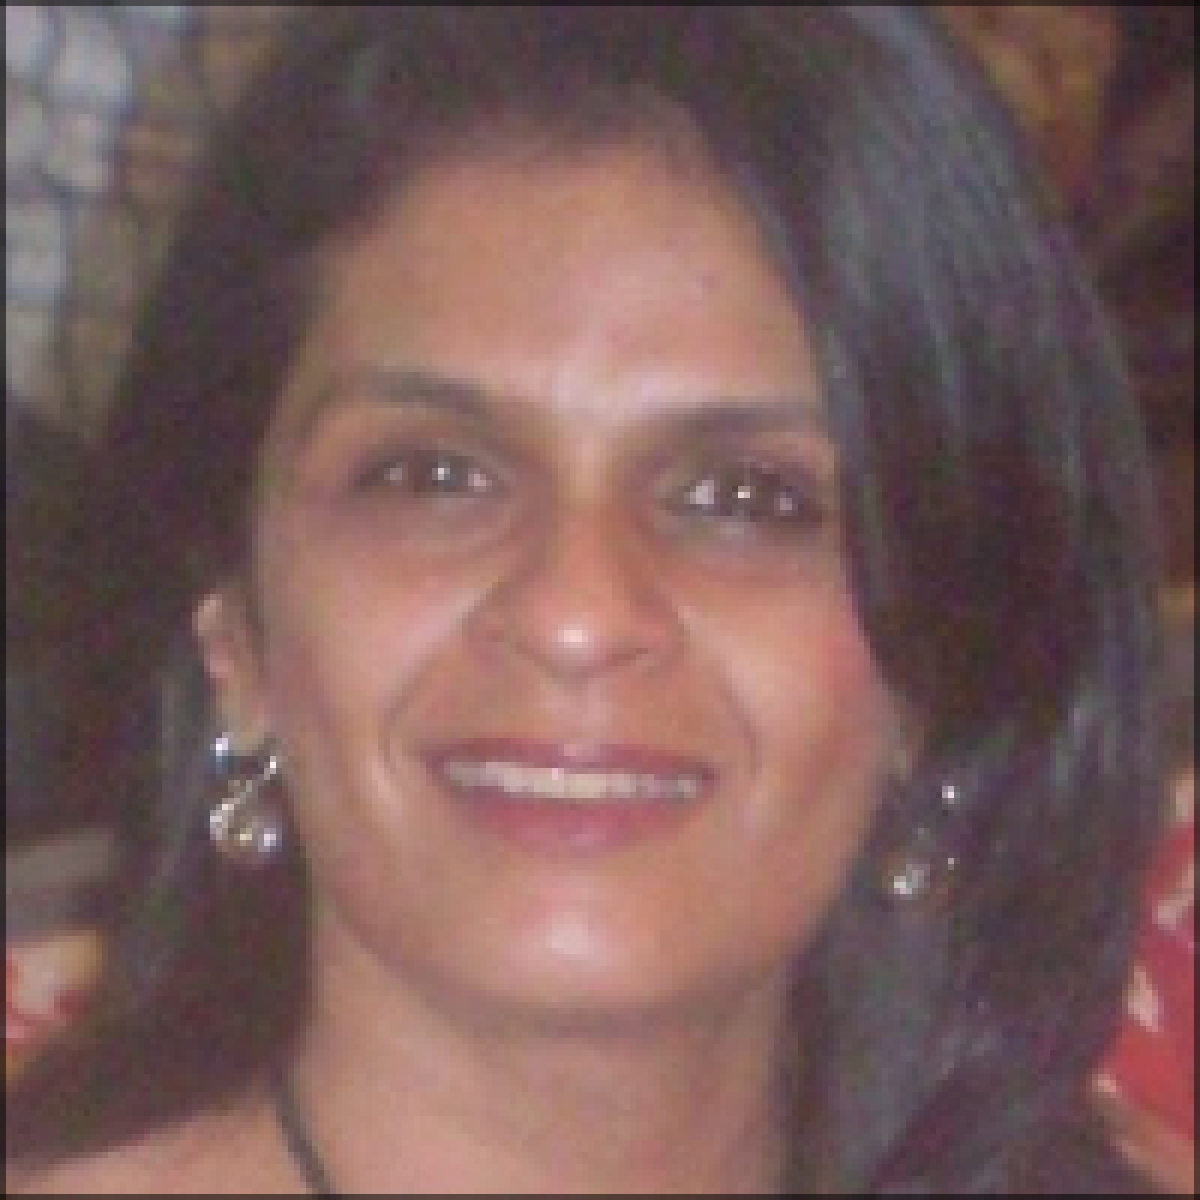 Starbucks appoints Deepa Krishnan as Head Marketing, Digital